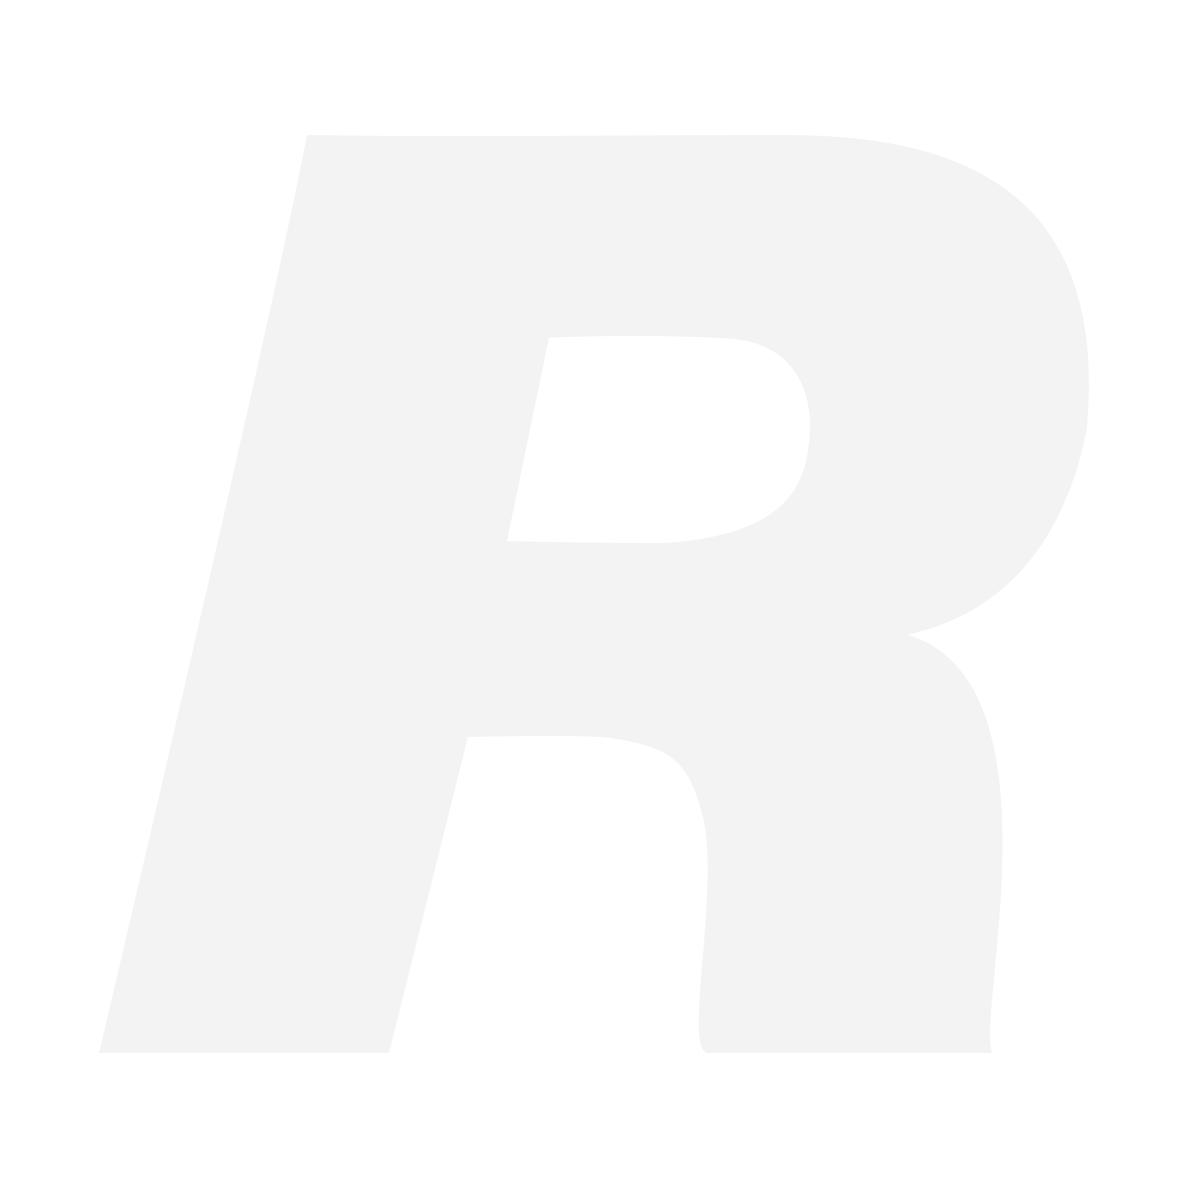 Voigtländer 15/4.5 Heliar Super Wide, Sony FE